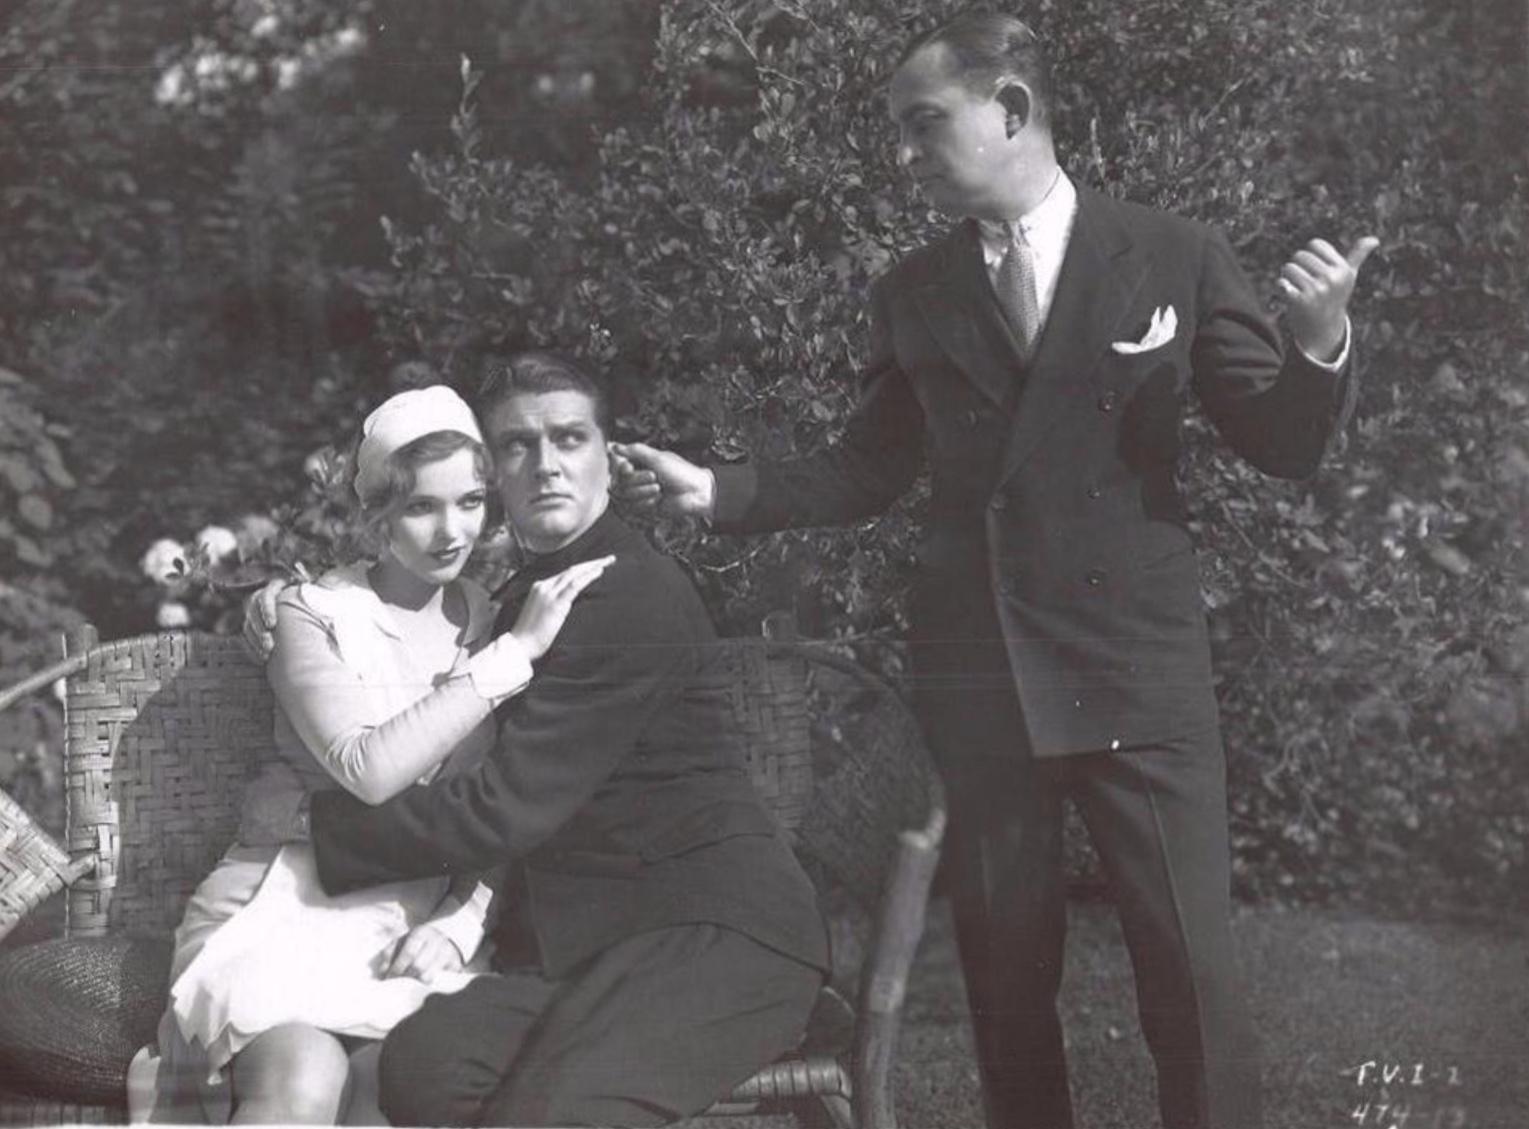 Sally Blane, Allen Kearns, and Hugh Trevor in The Very Idea (1929)